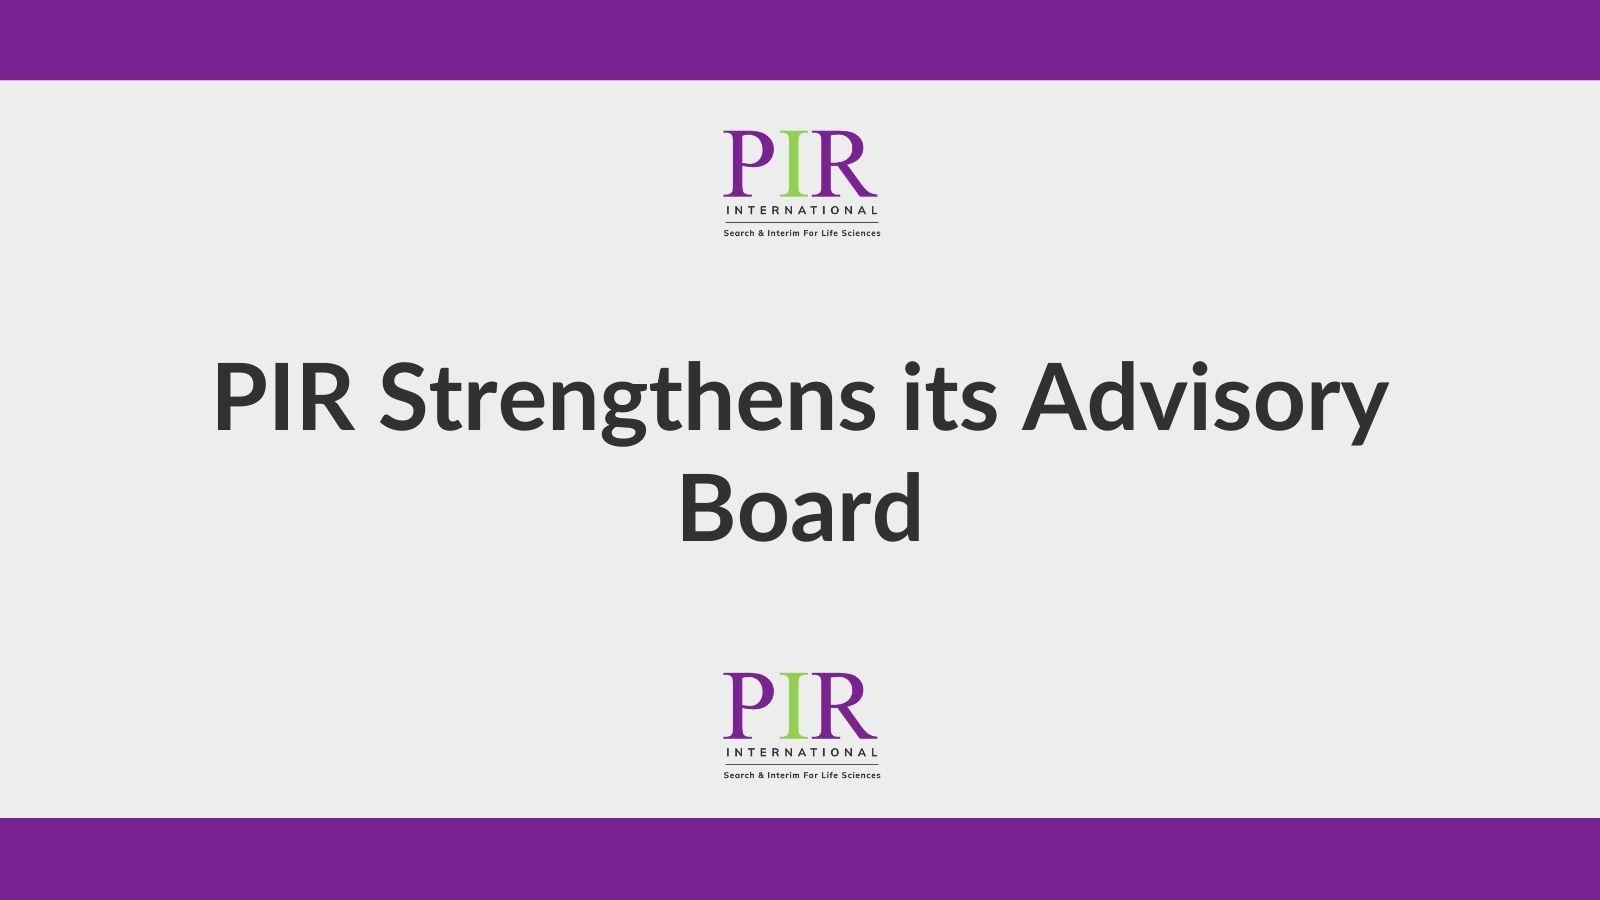 PIR Strengthens its Advisory Board